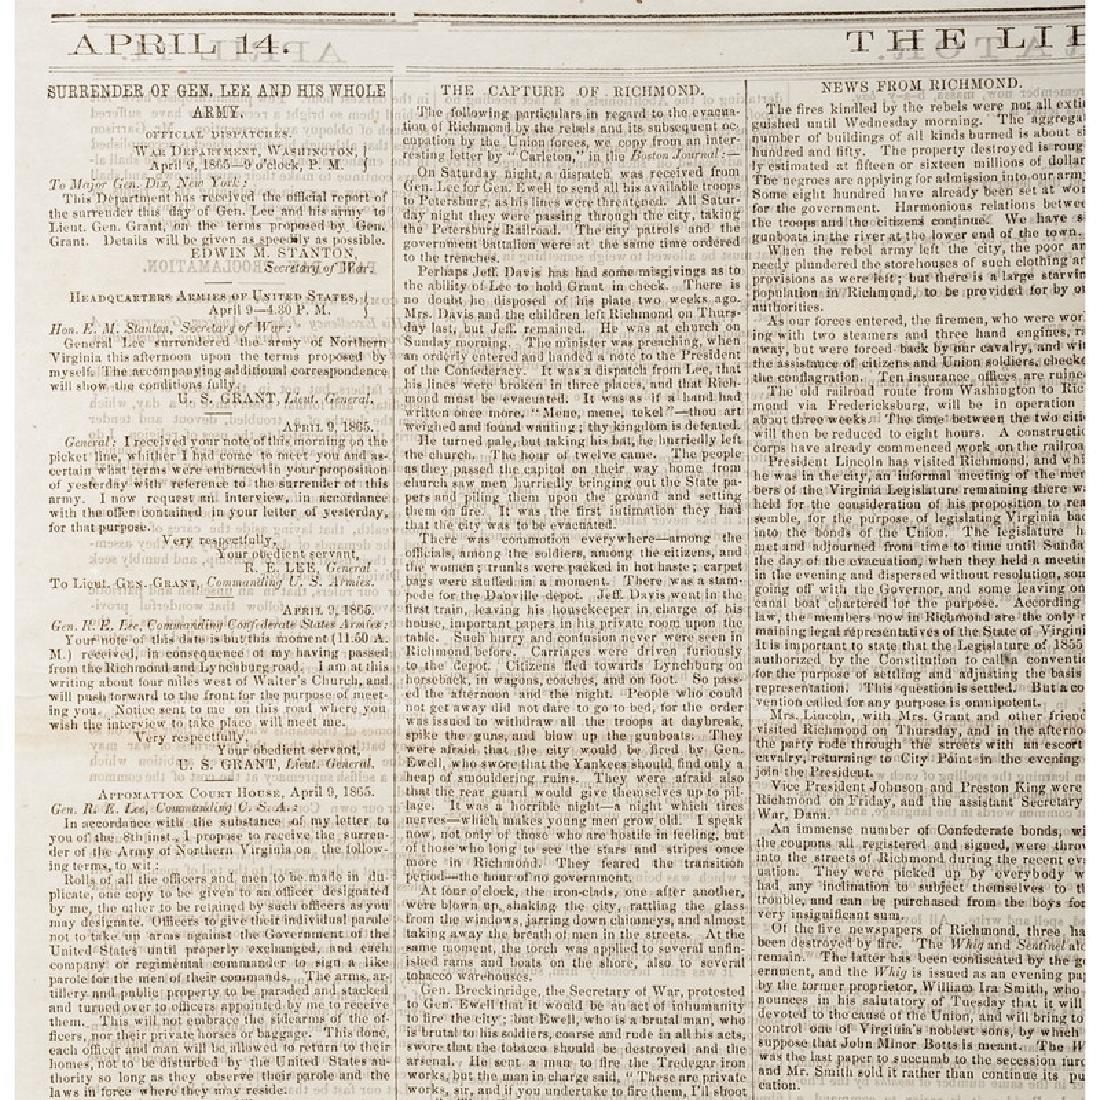 Anti-Slavery Newspaper, Liberator, Covering Surrender - 3